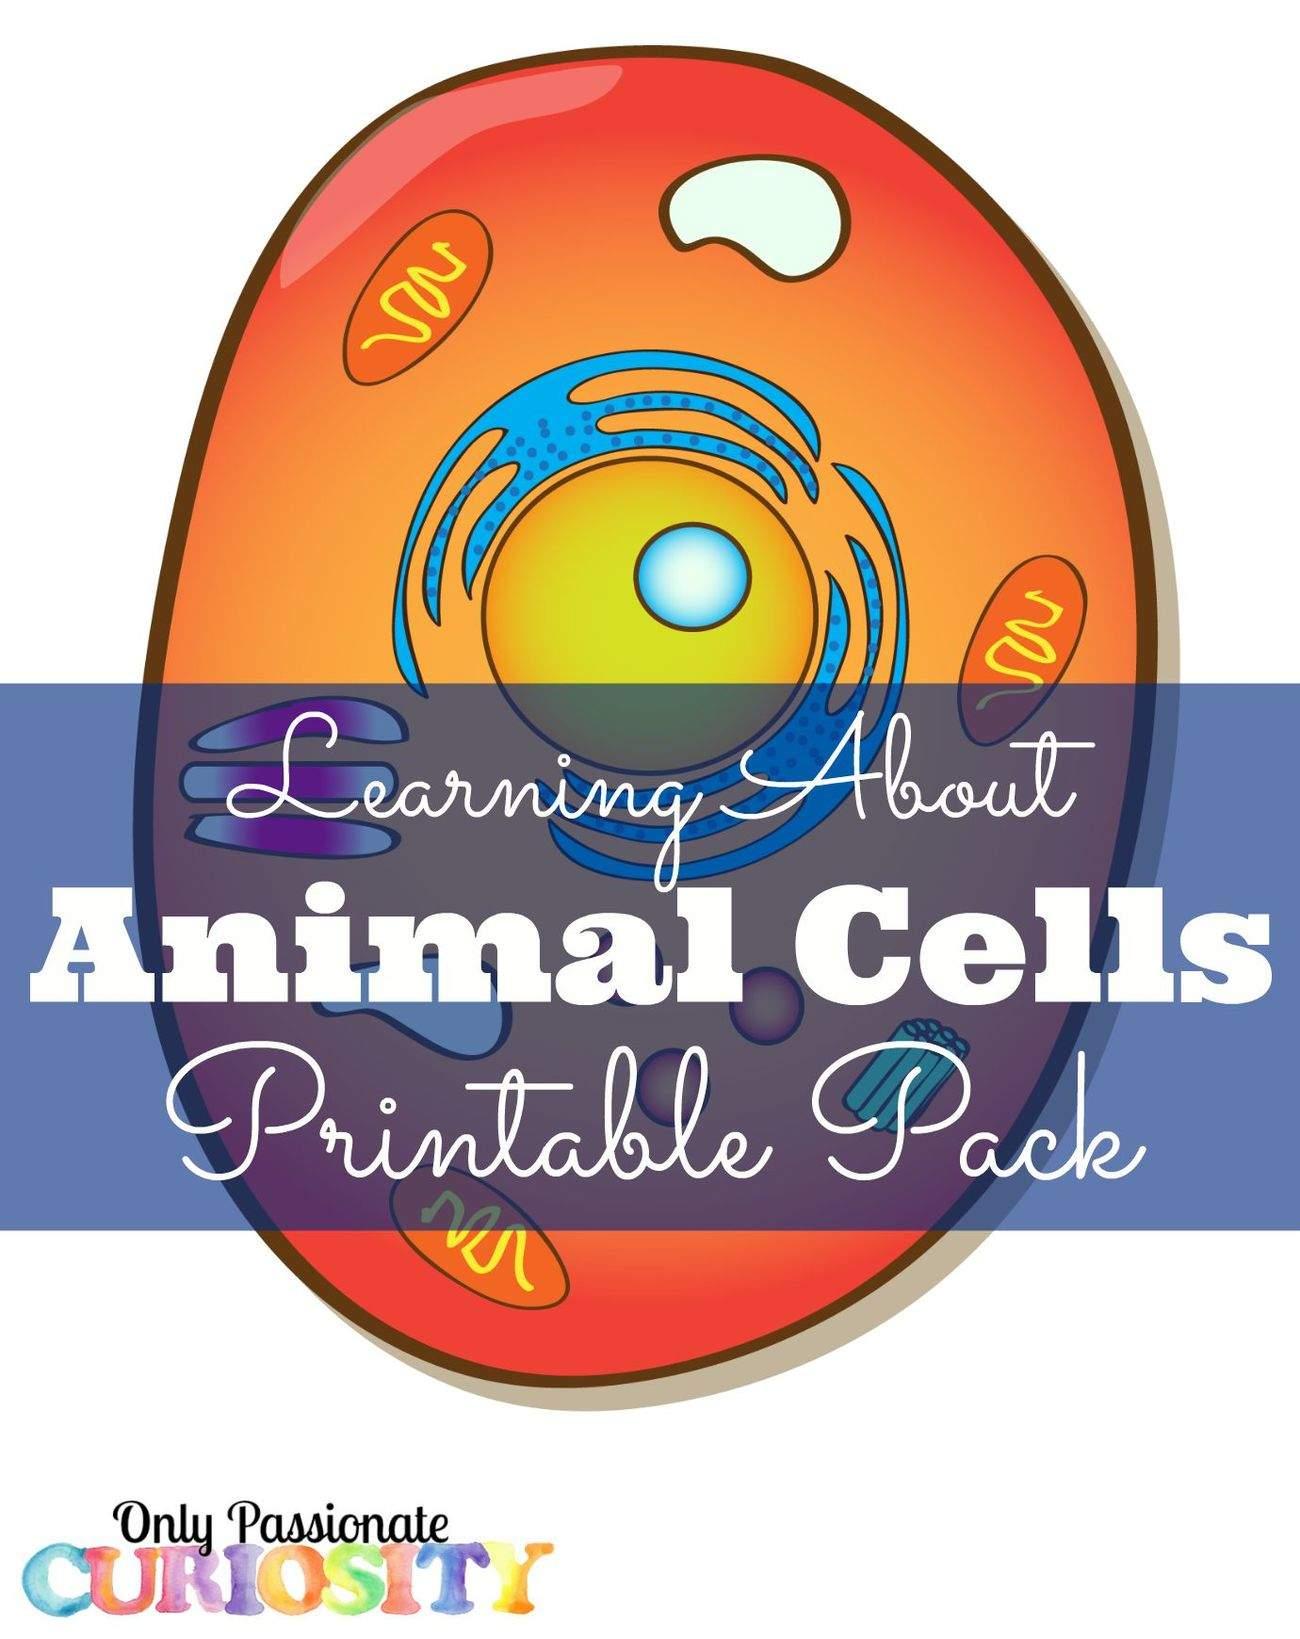 Animal Cell Printable Pack